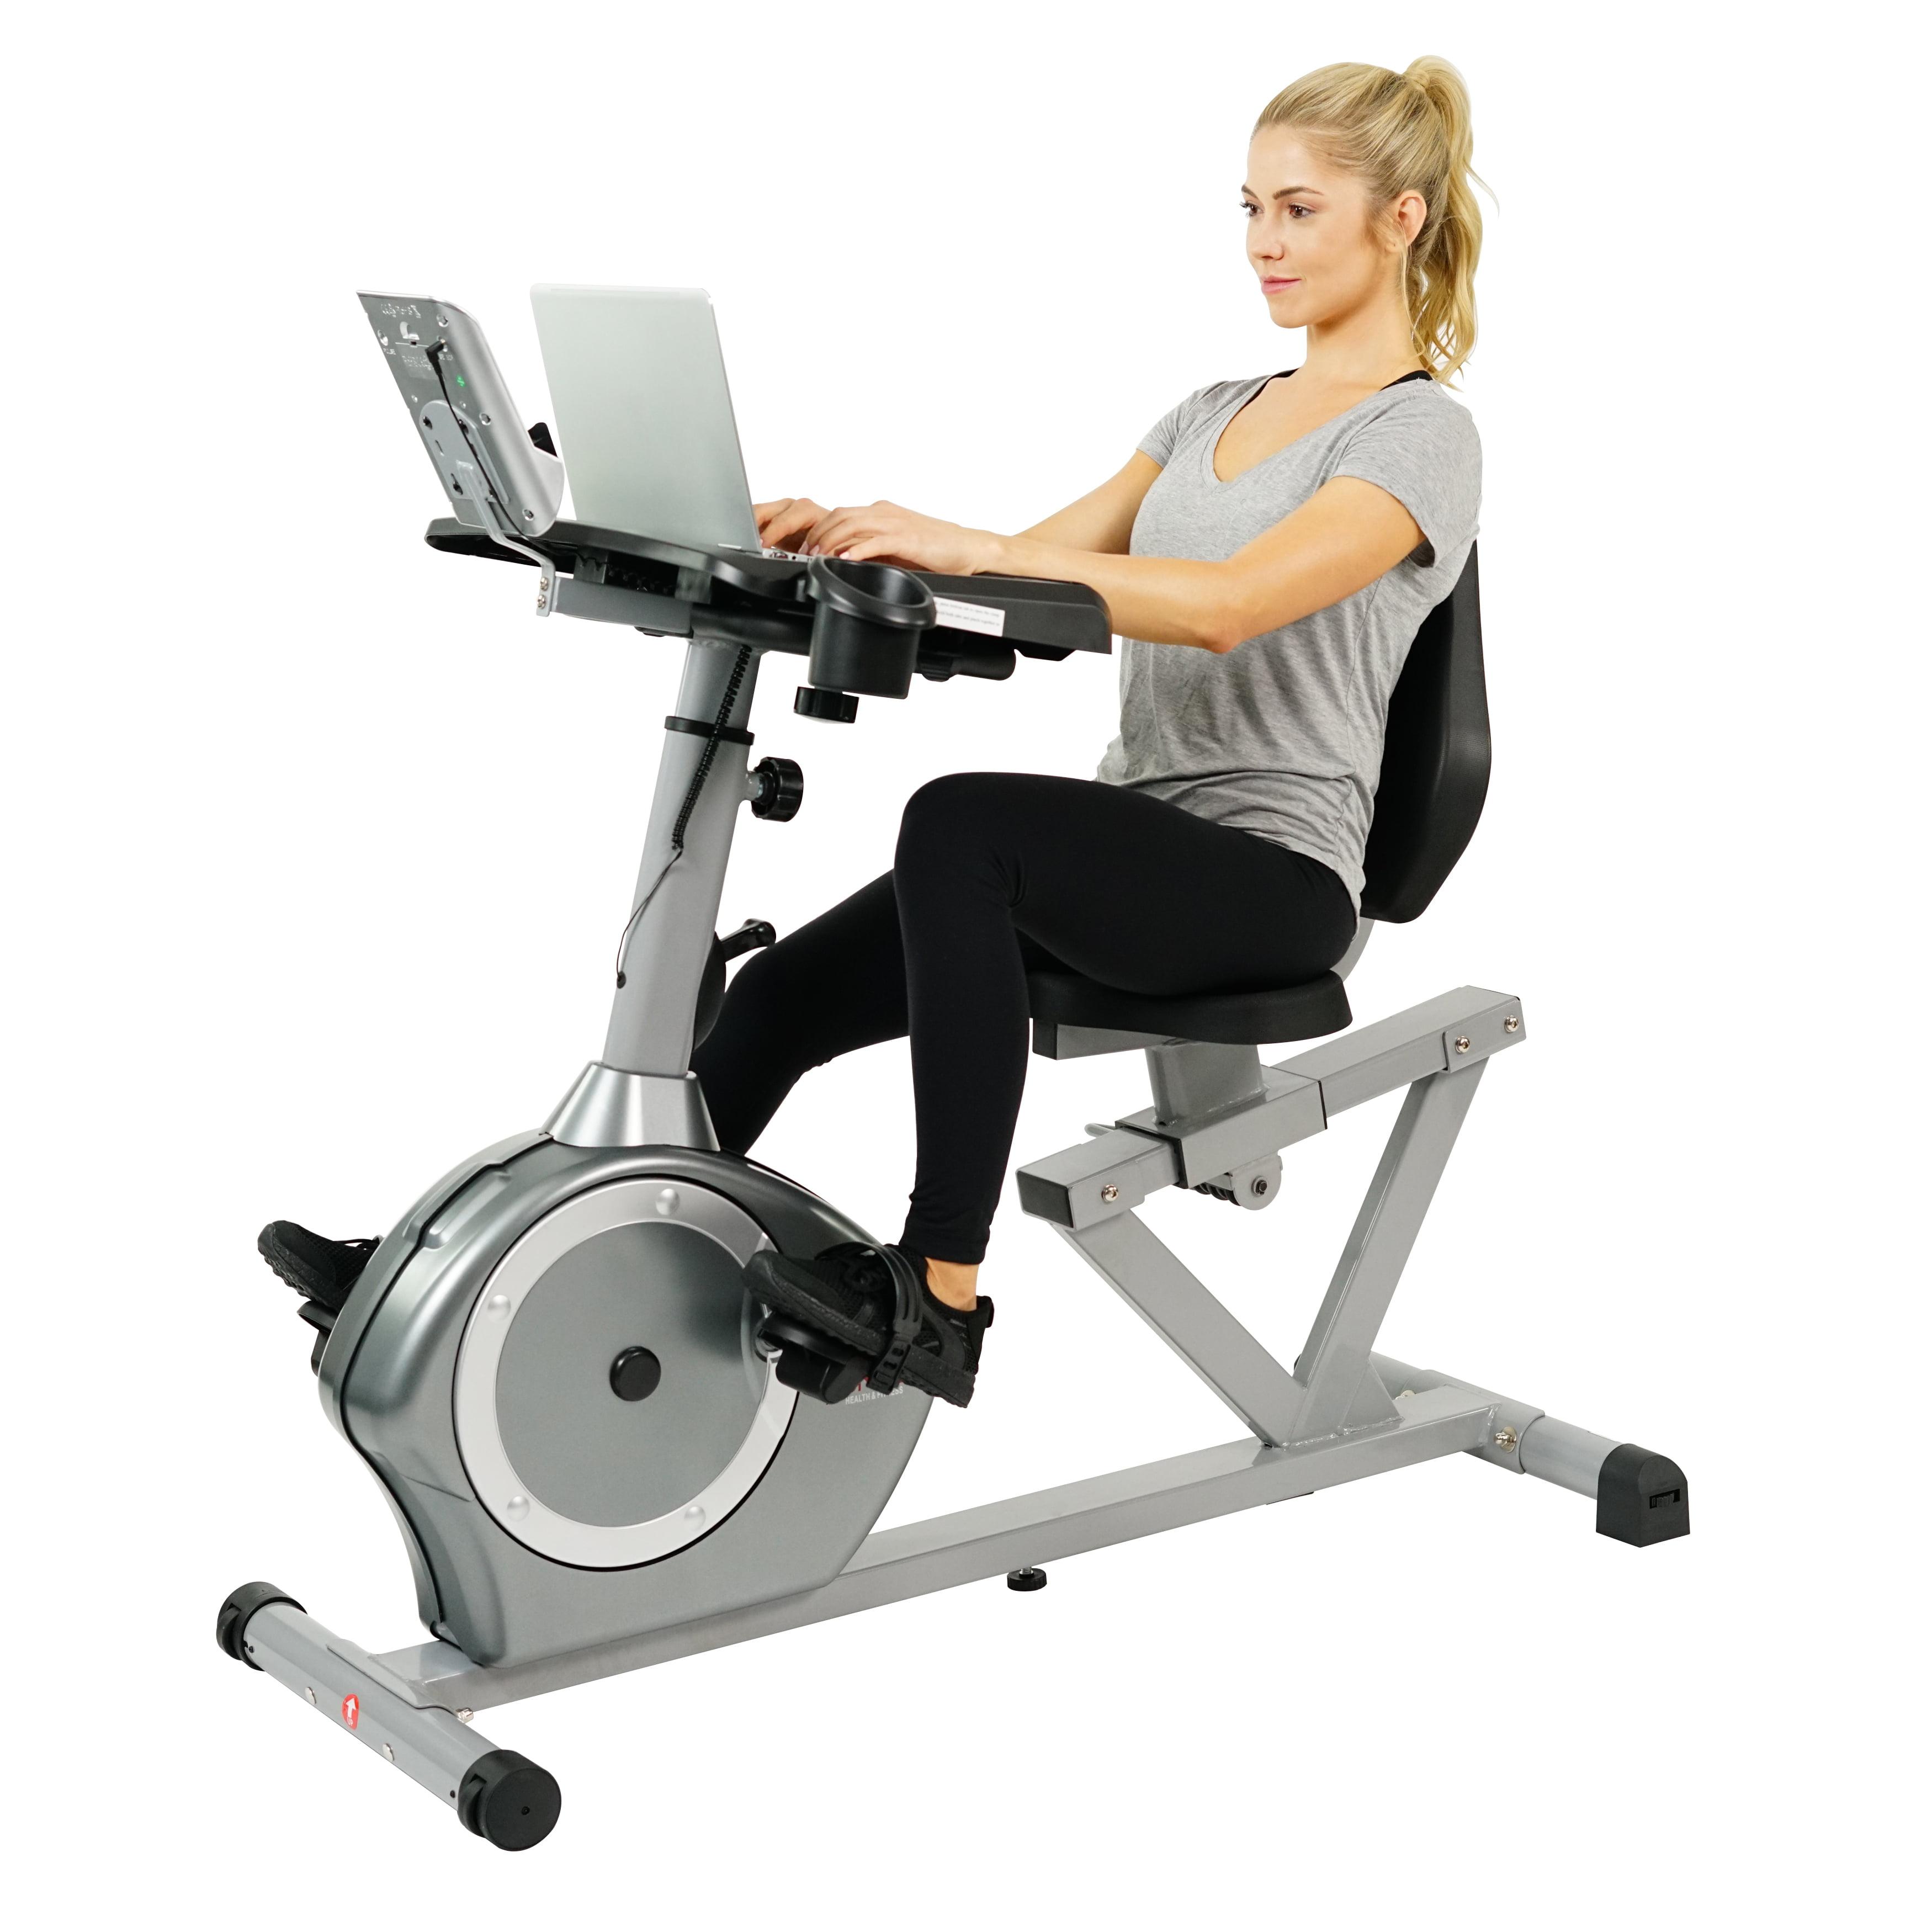 sunny health u0026 fitness recumbent desk exercise bike with adjustable magnetic resistance belt drive